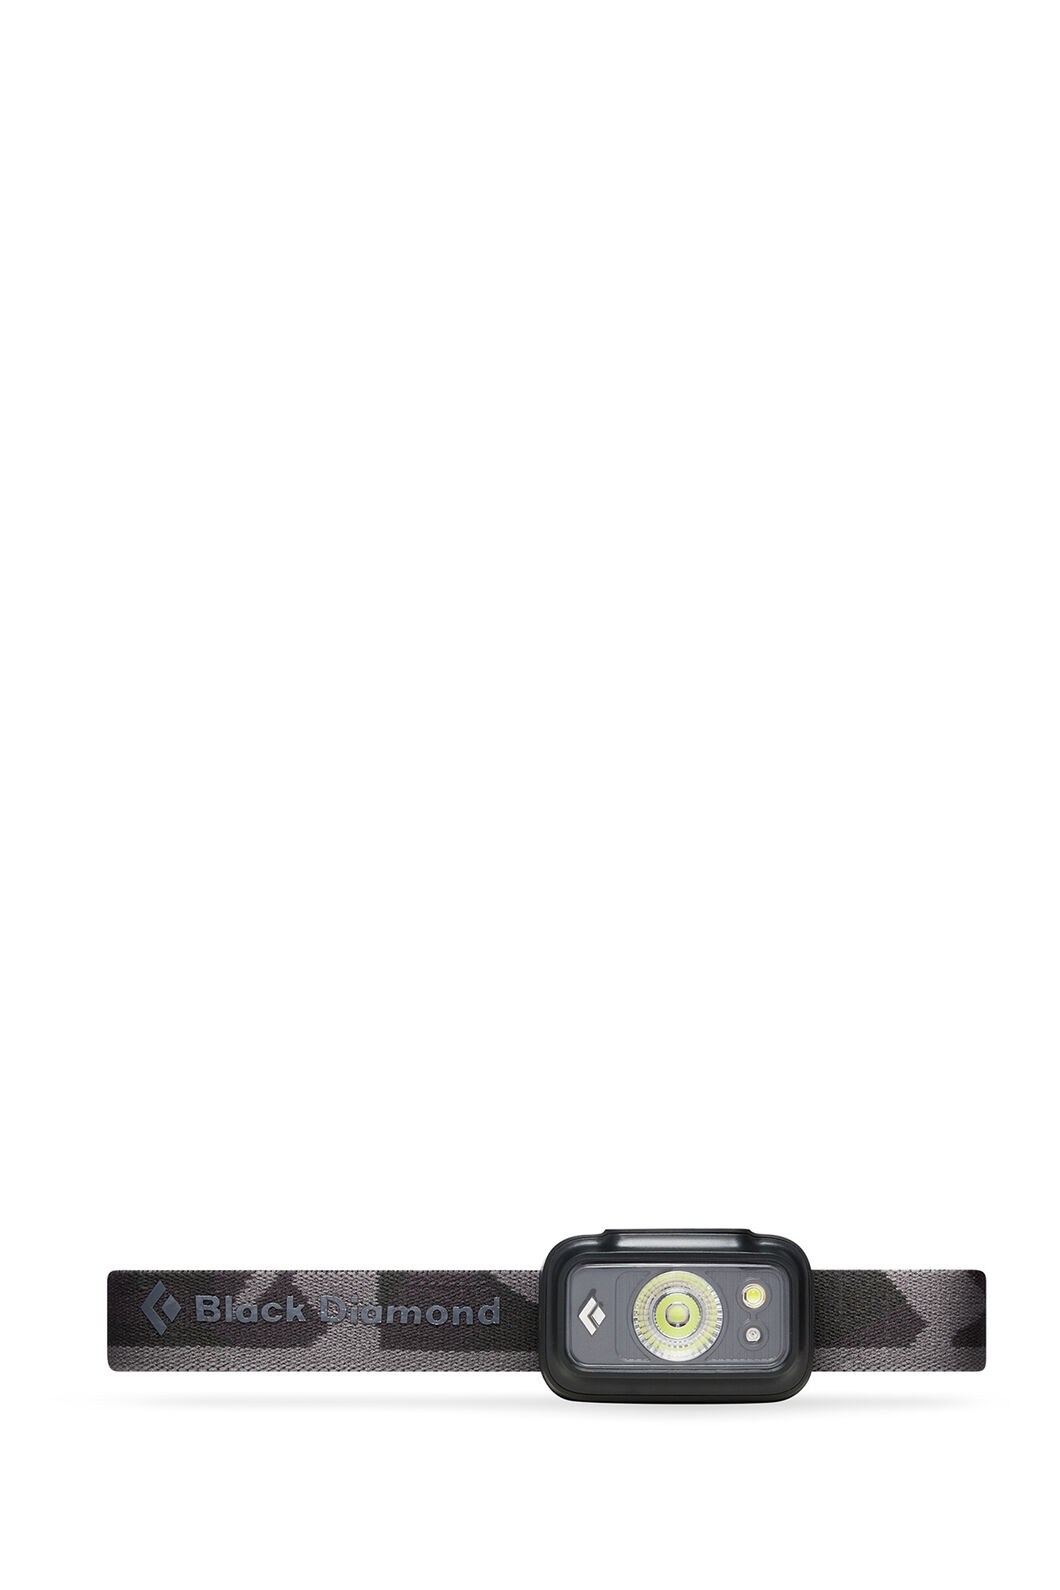 Black Diamond Cosmo 250 Headlamp, Black, hi-res